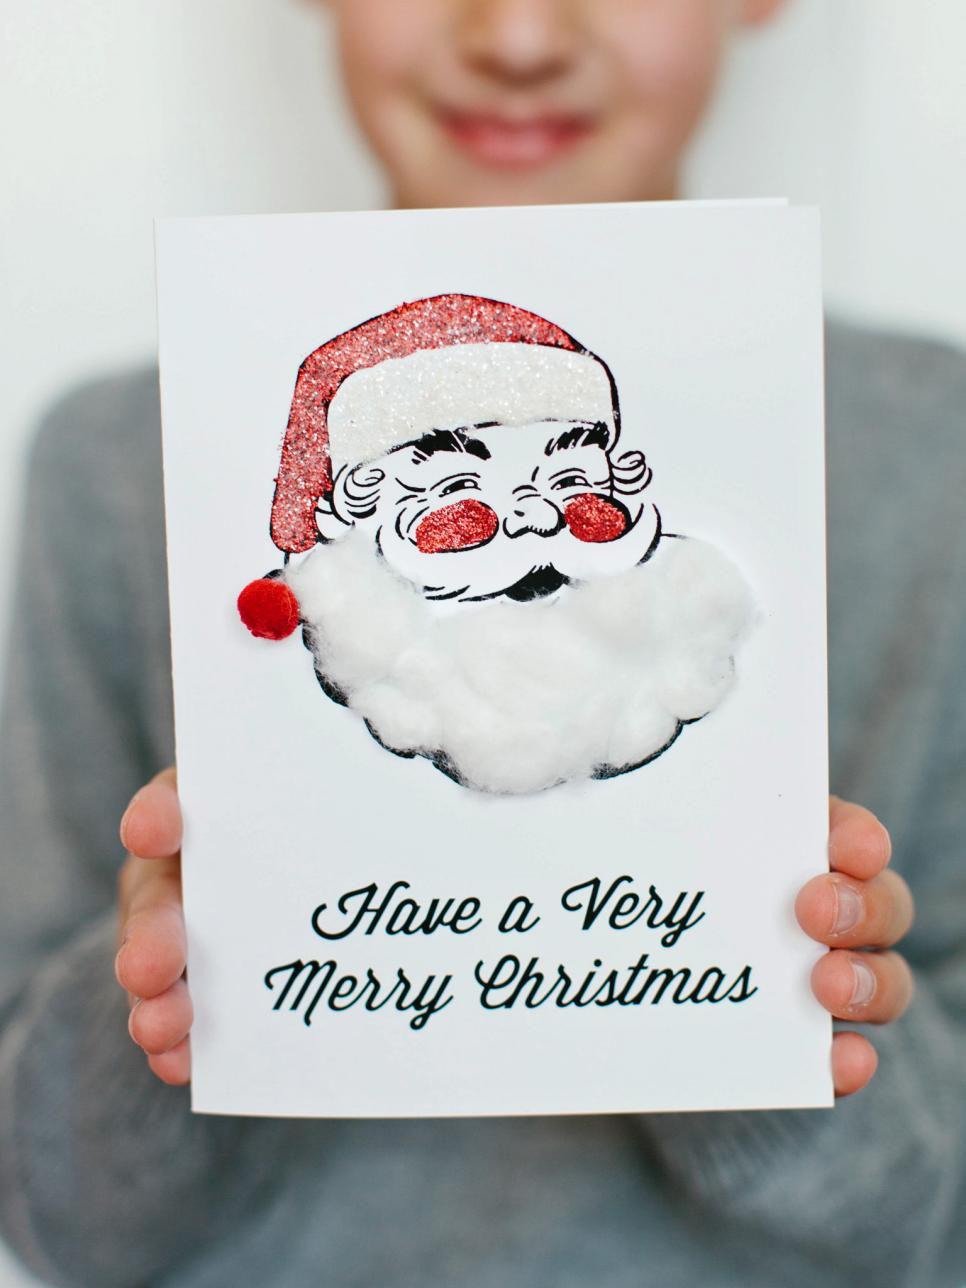 Merry Chrystmas